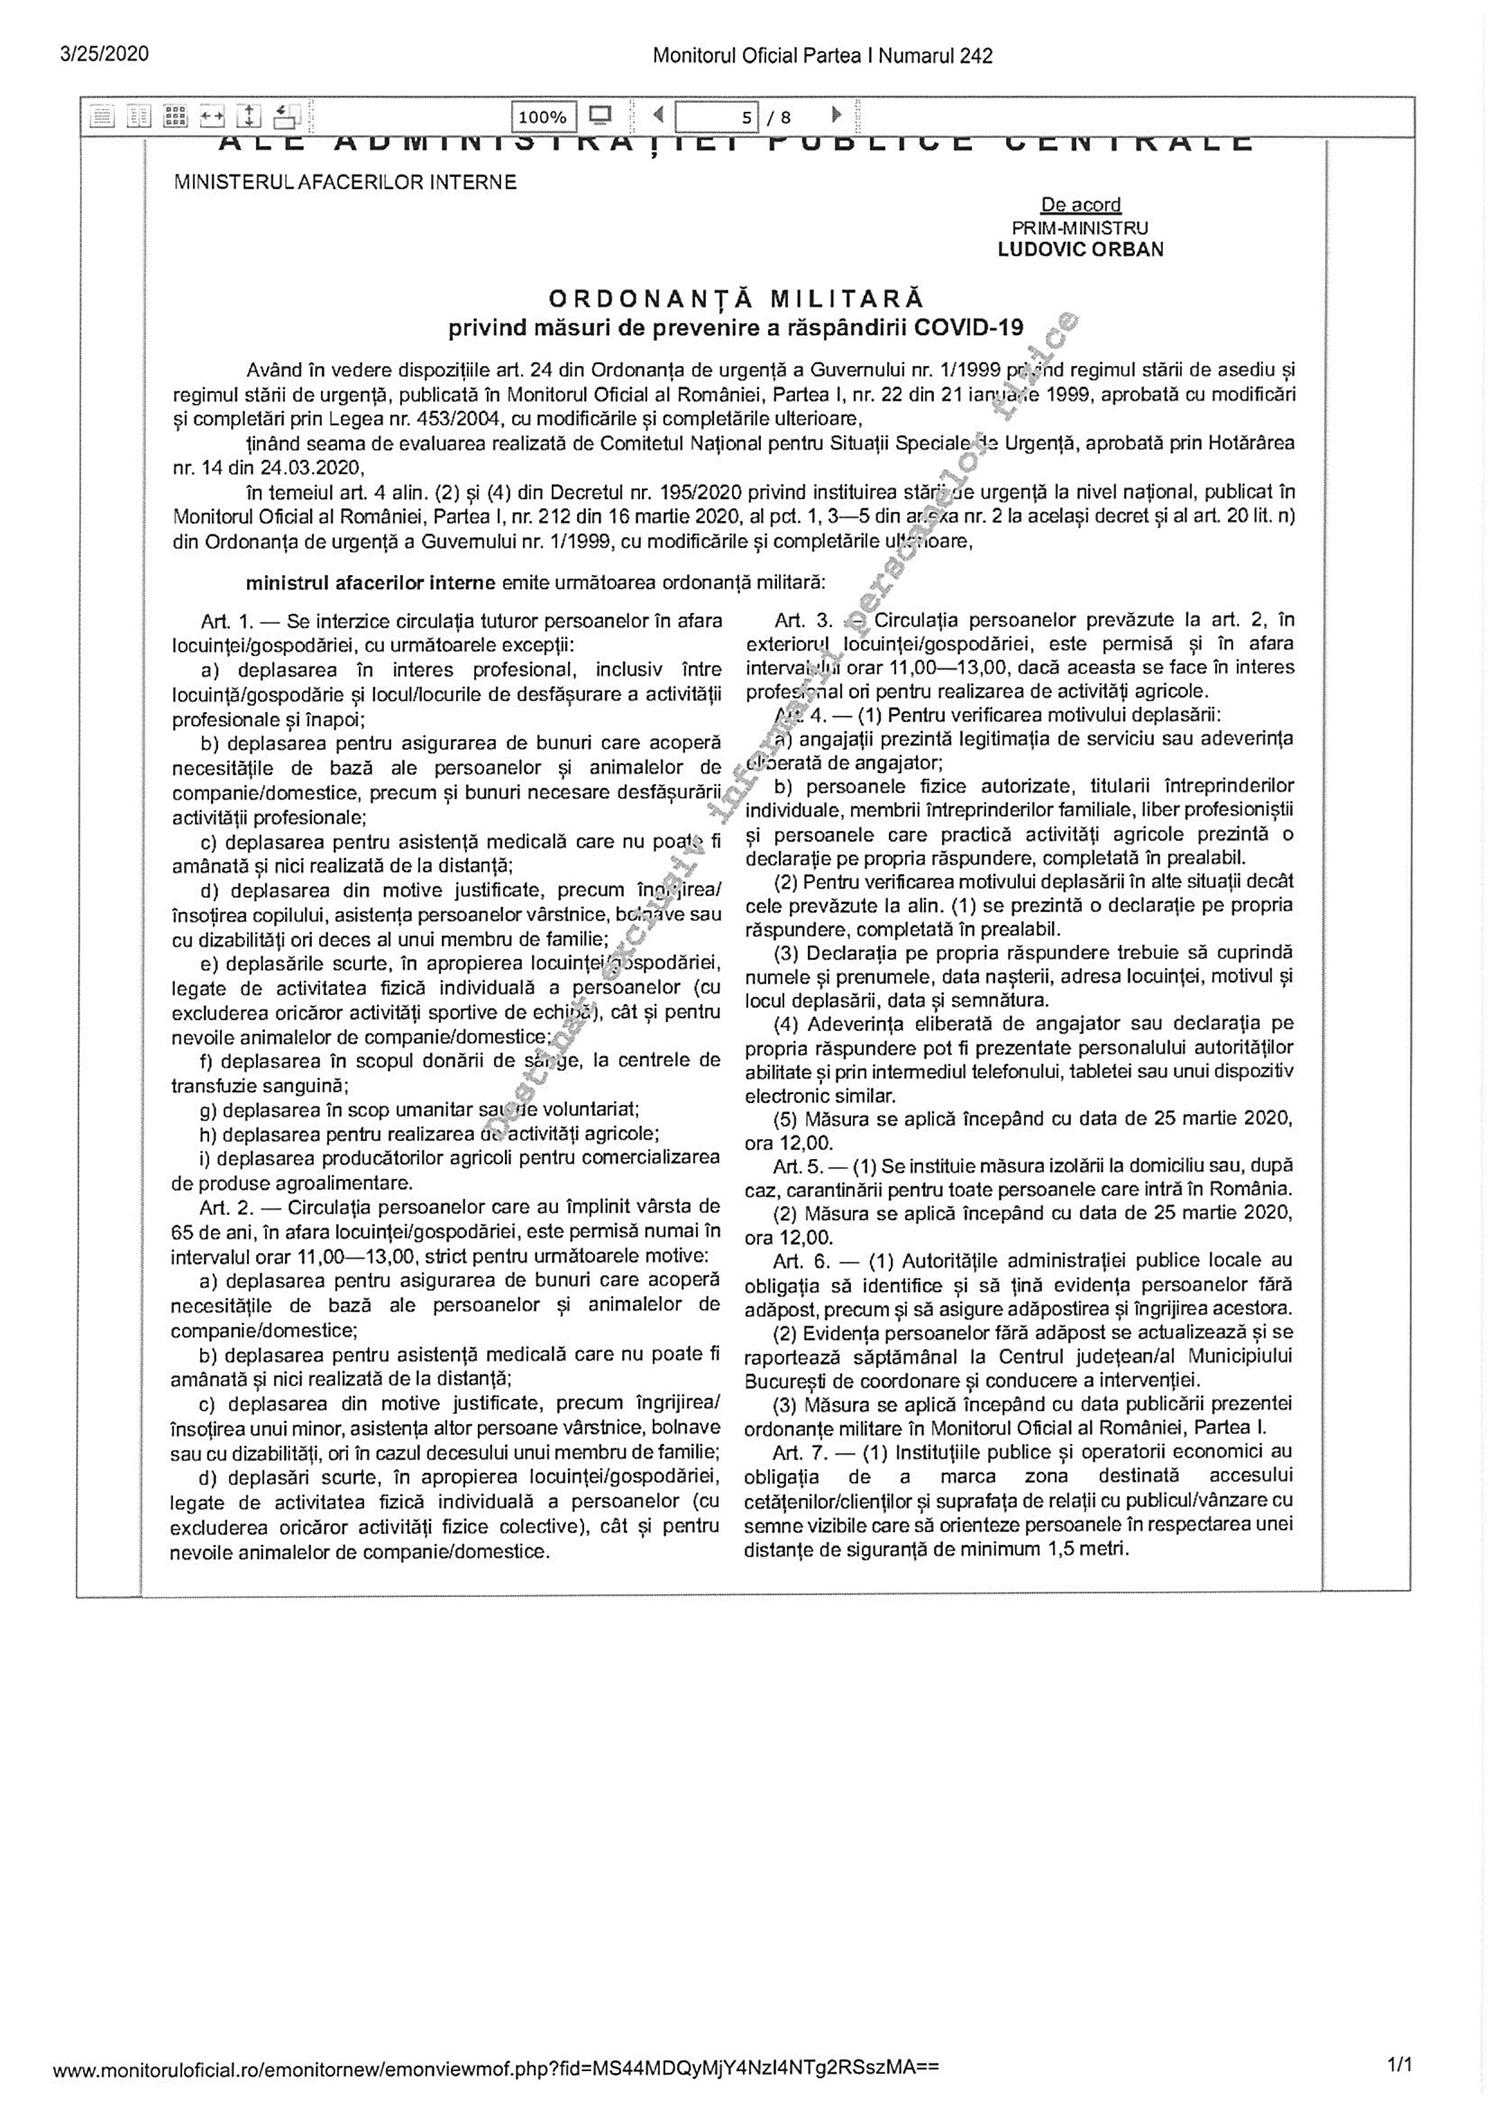 MOf 242 Ord Militara 3 din 2020 2